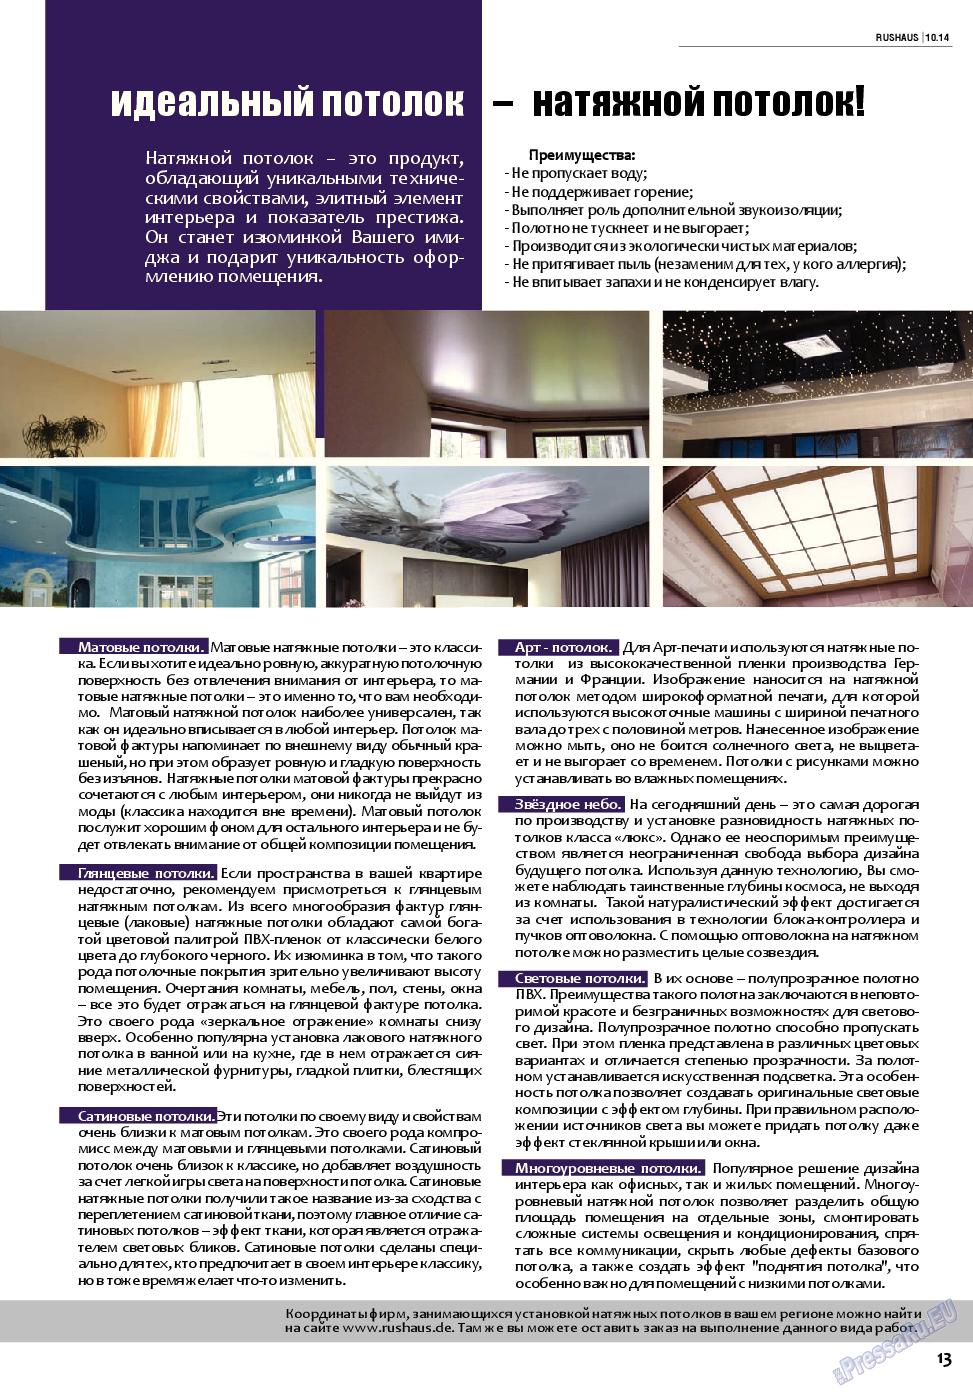 RusHaus (журнал). 2014 год, номер 2, стр. 13